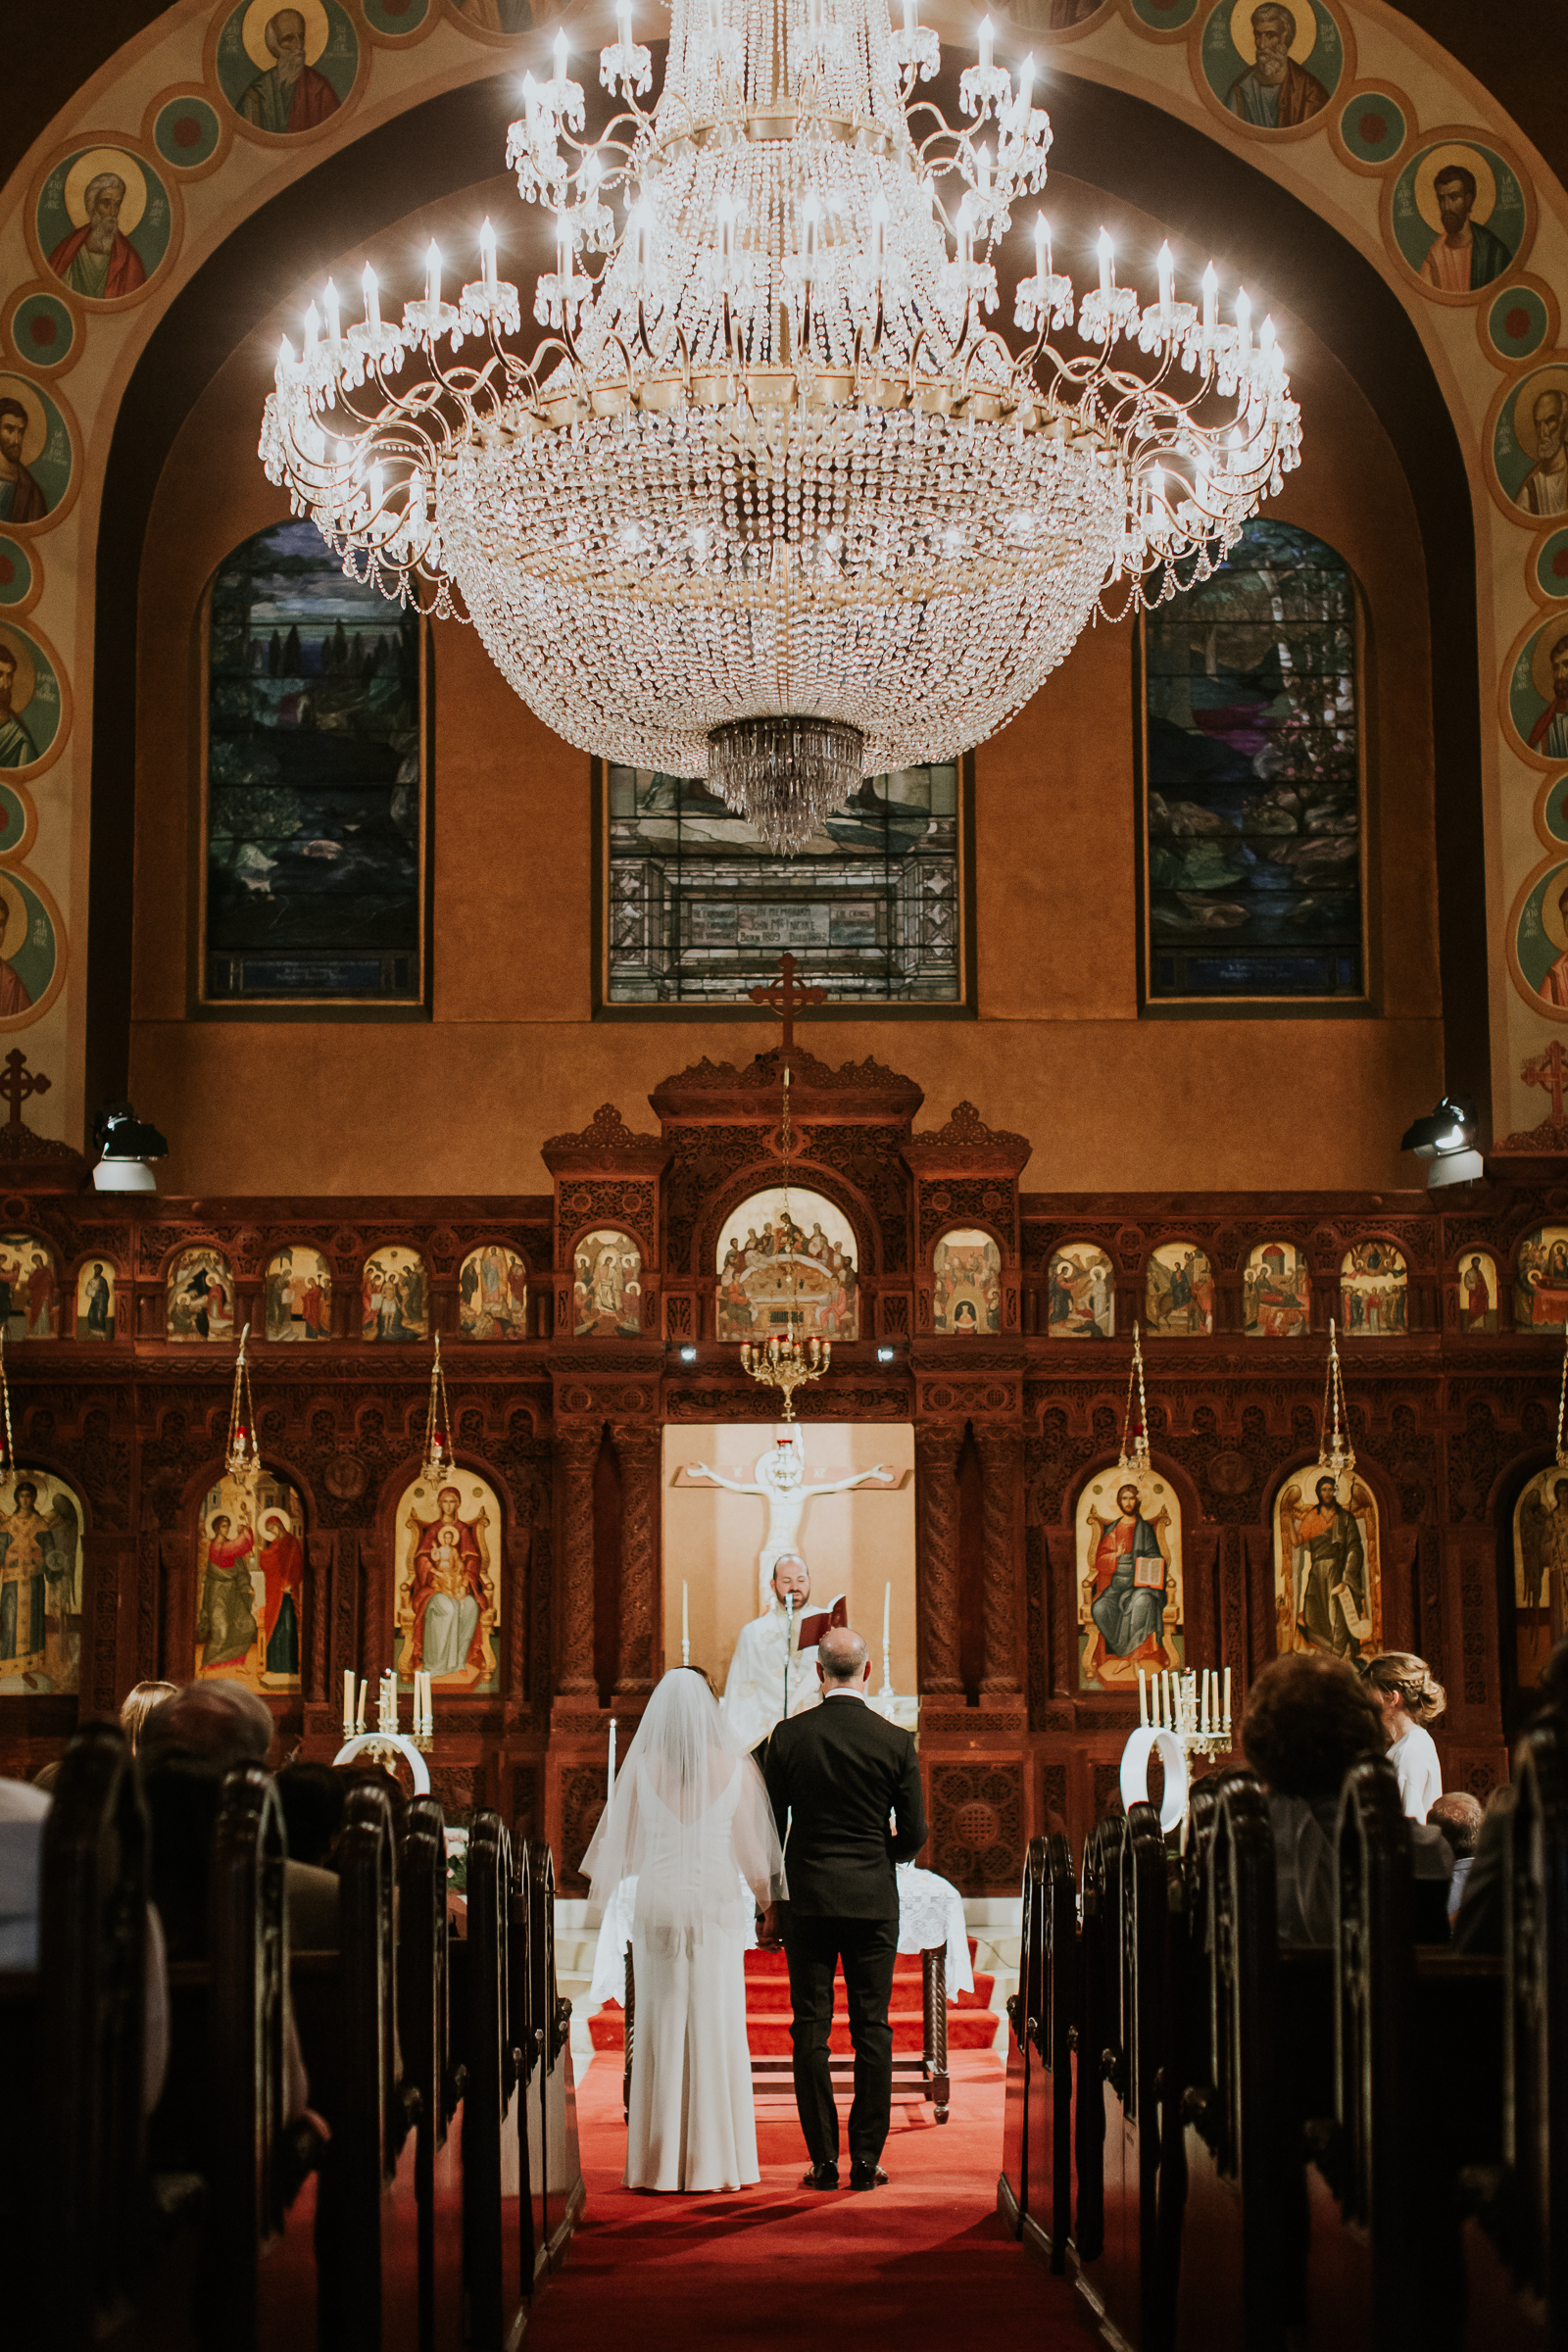 Robert-NYC-Museum-Of-Arts-&-Design-Greek-Italian-New-York-Documentary-Wedding-Photographer-12.jpg